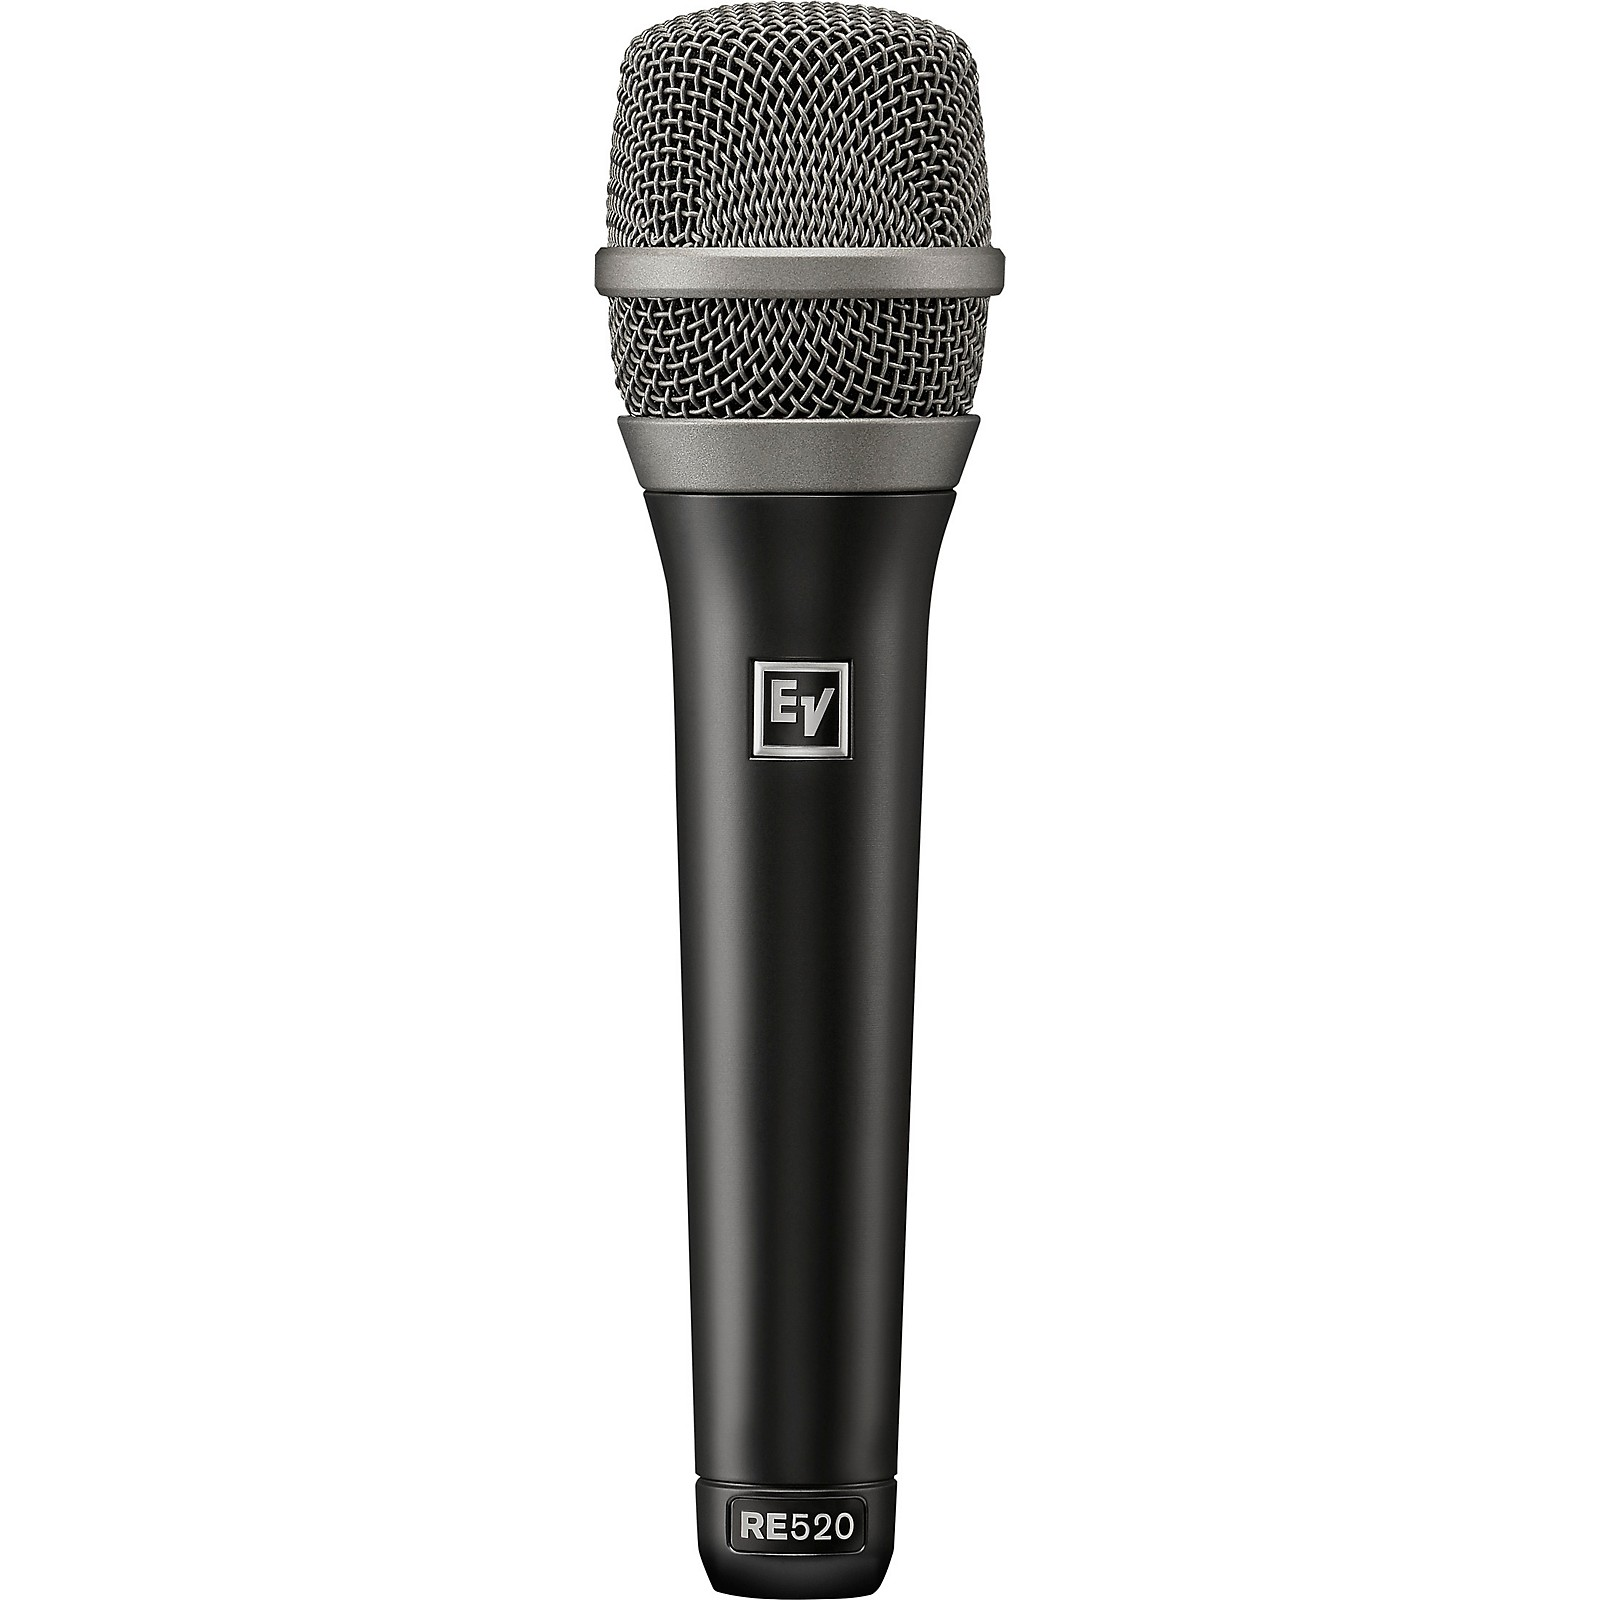 Open Box Electro-Voice RE520 Condenser Supercardioid Vocal Microphone